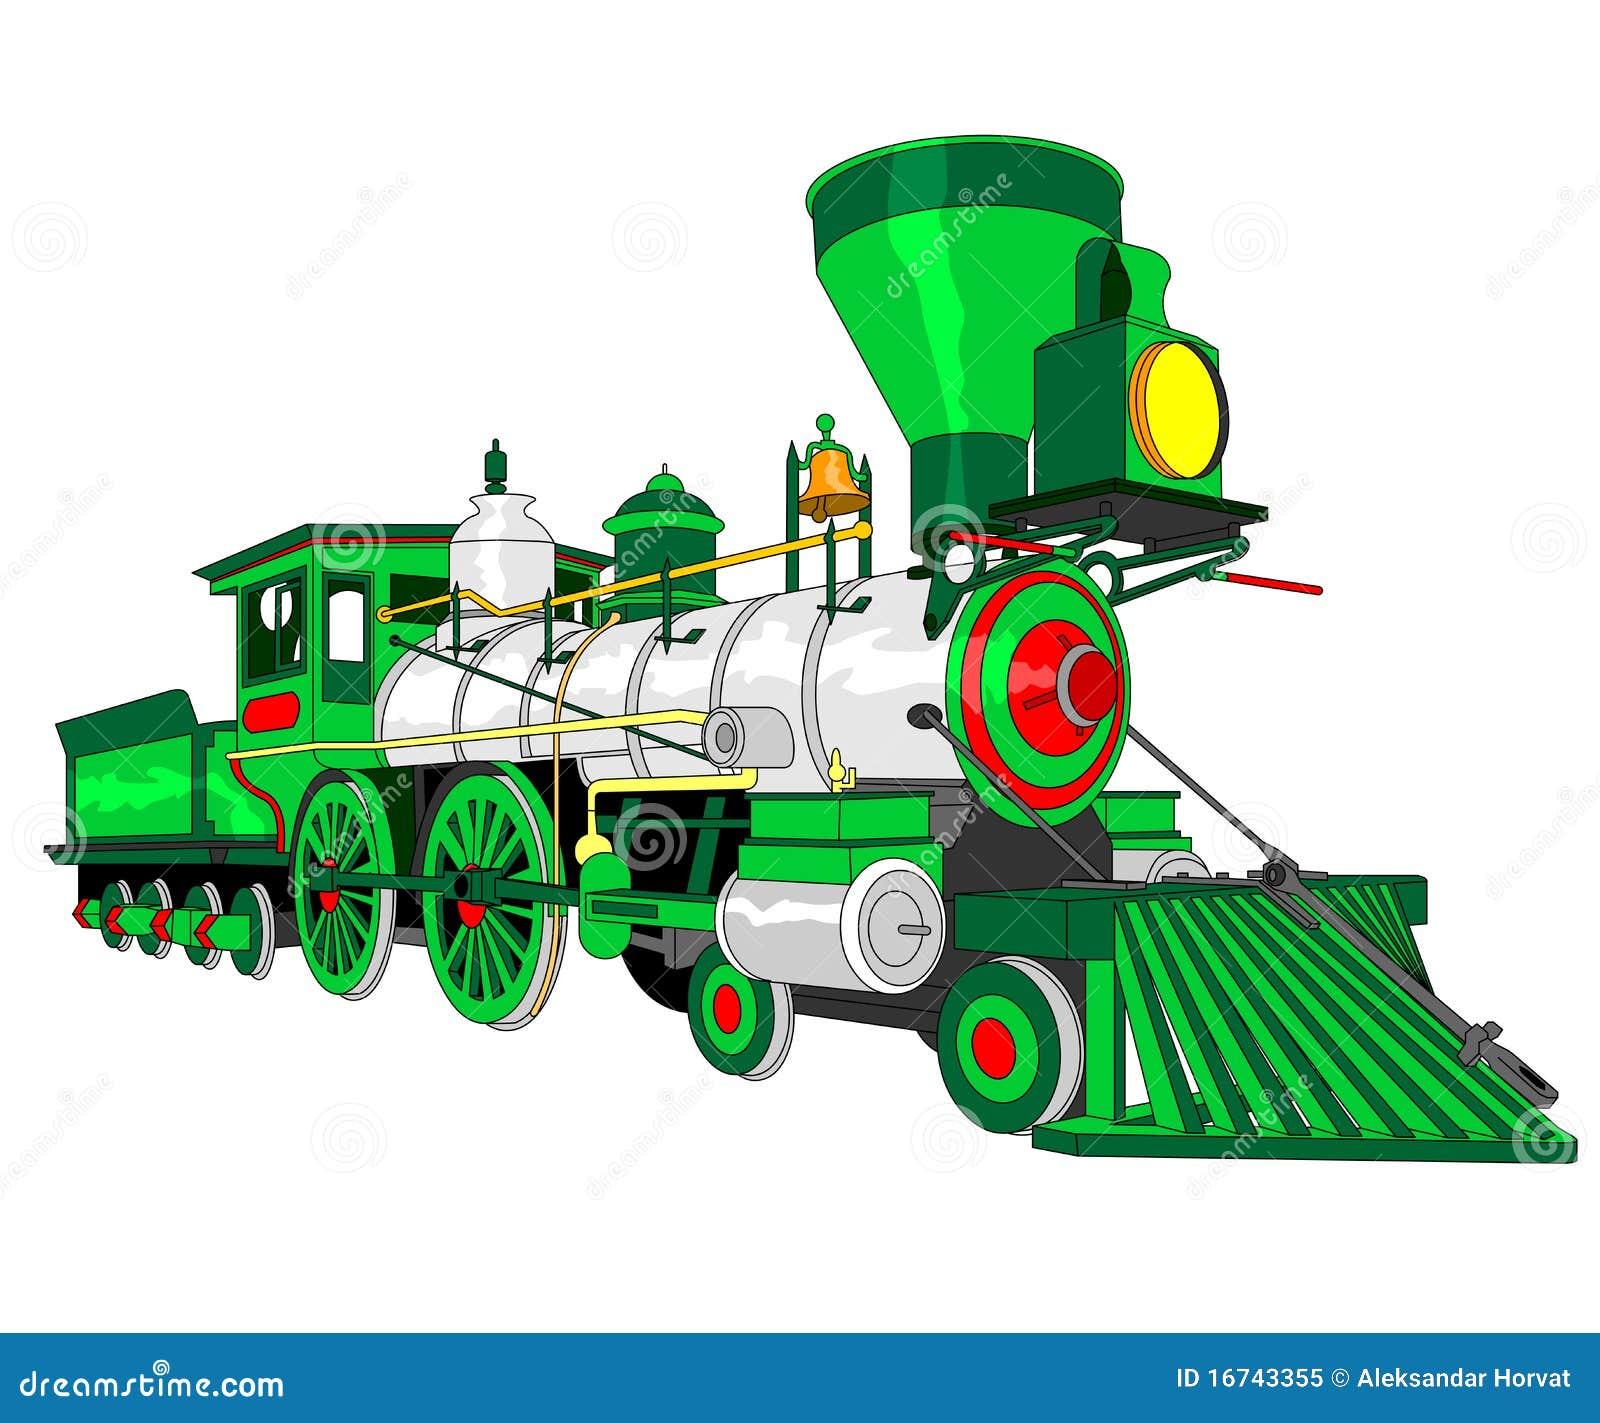 Steam Locomotive Illustration Stock Vector - Image: 16743355